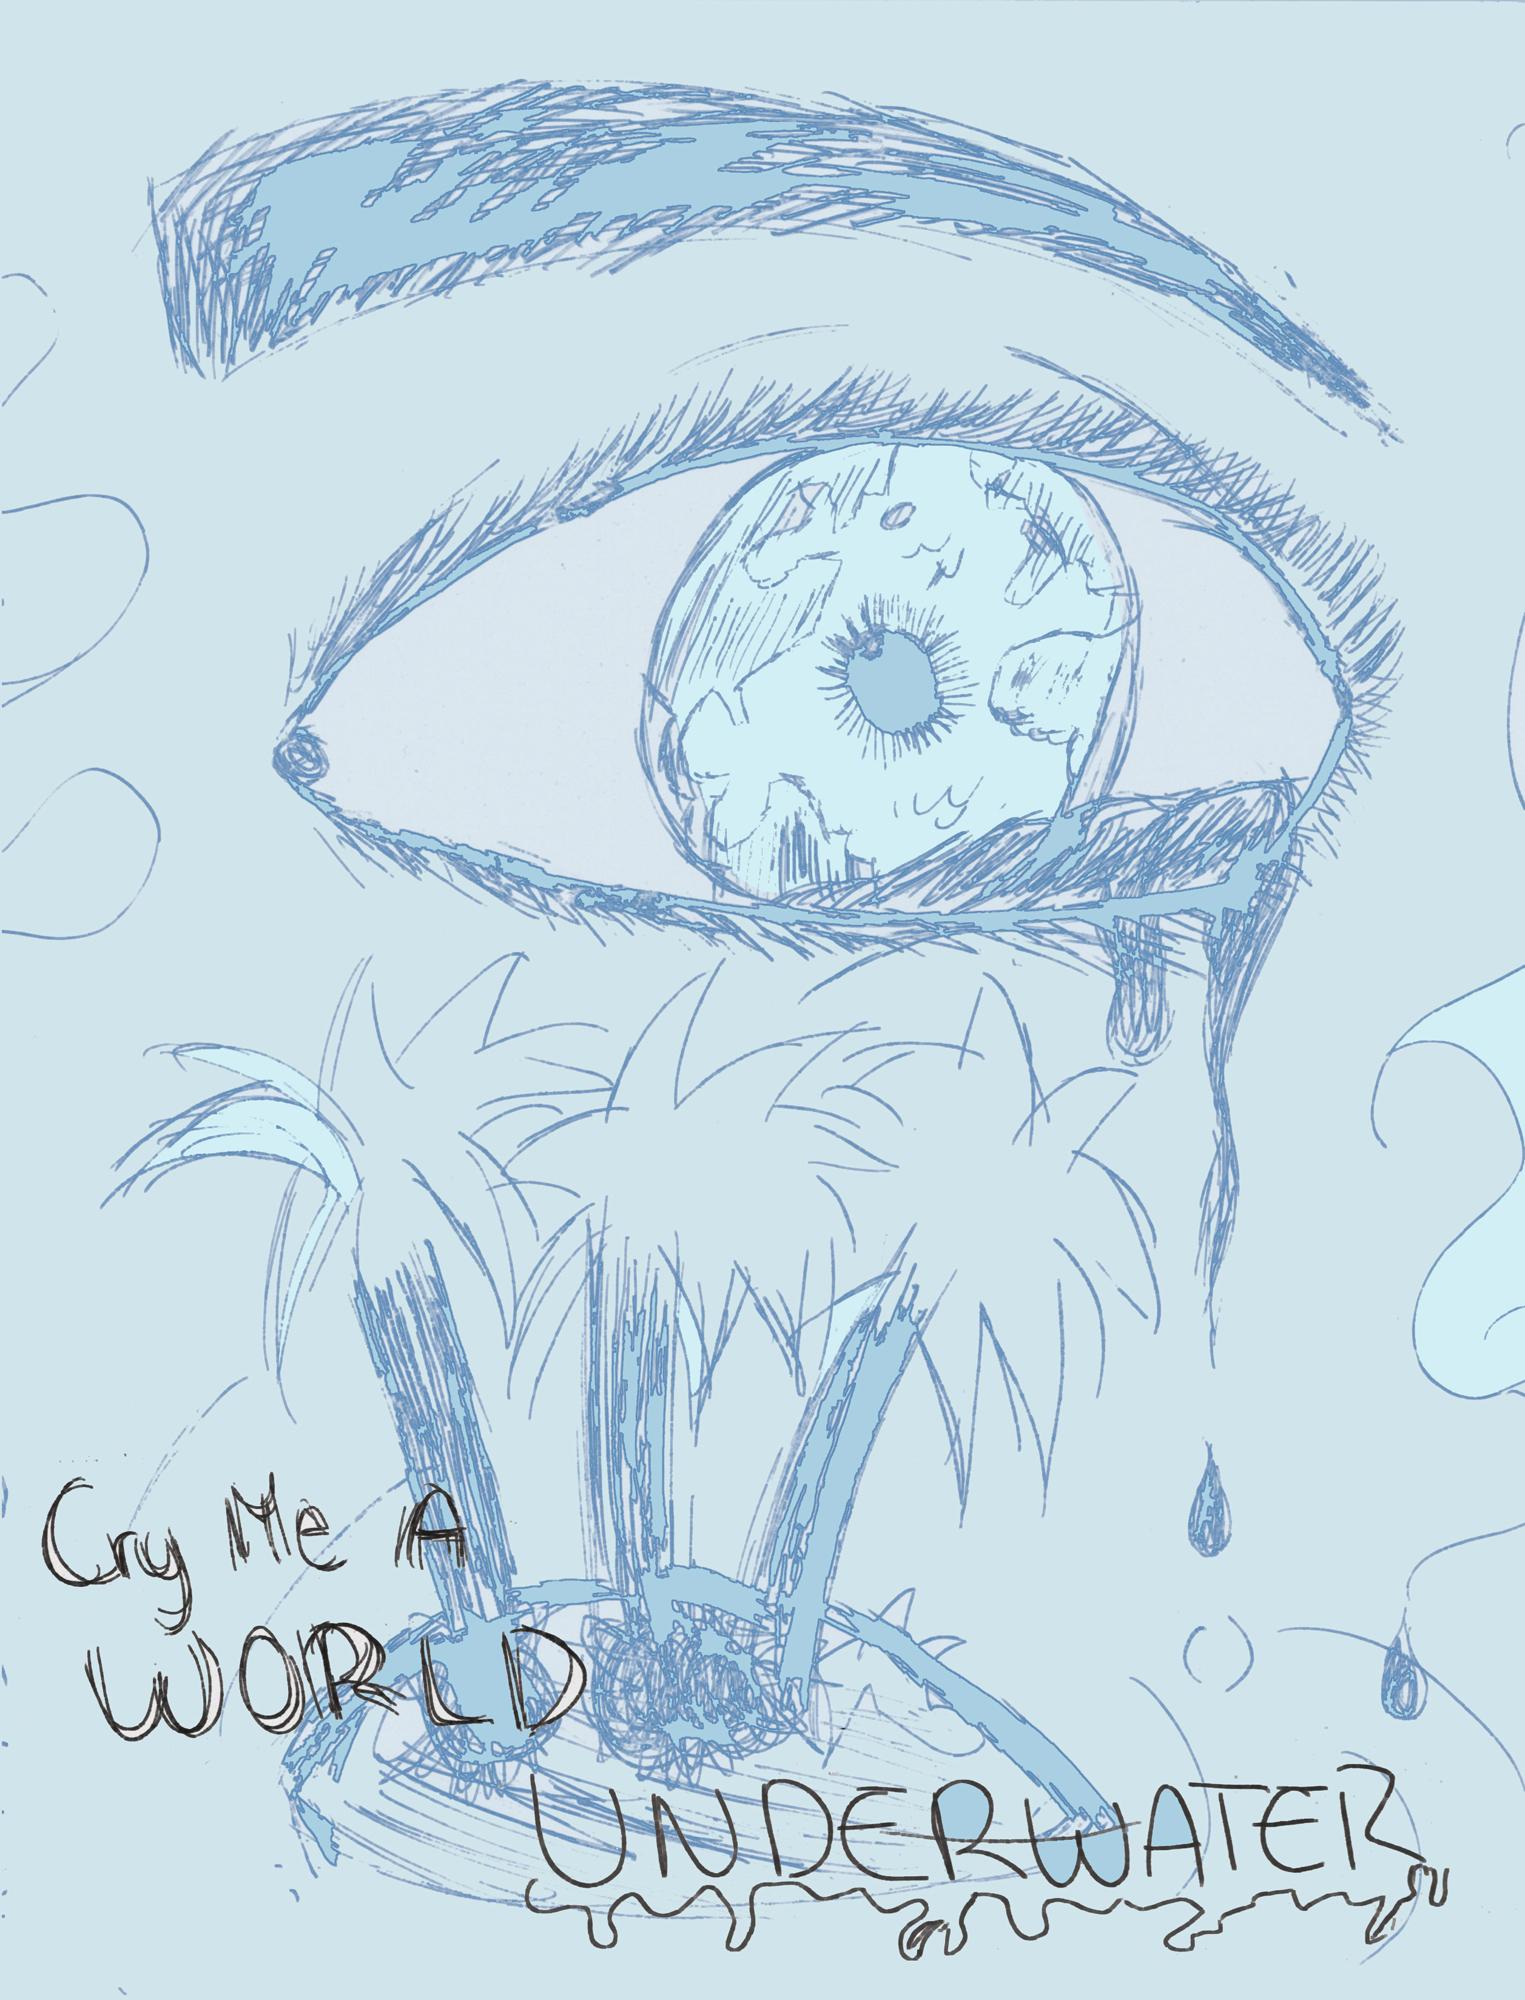 cry me a world underwater.jpg